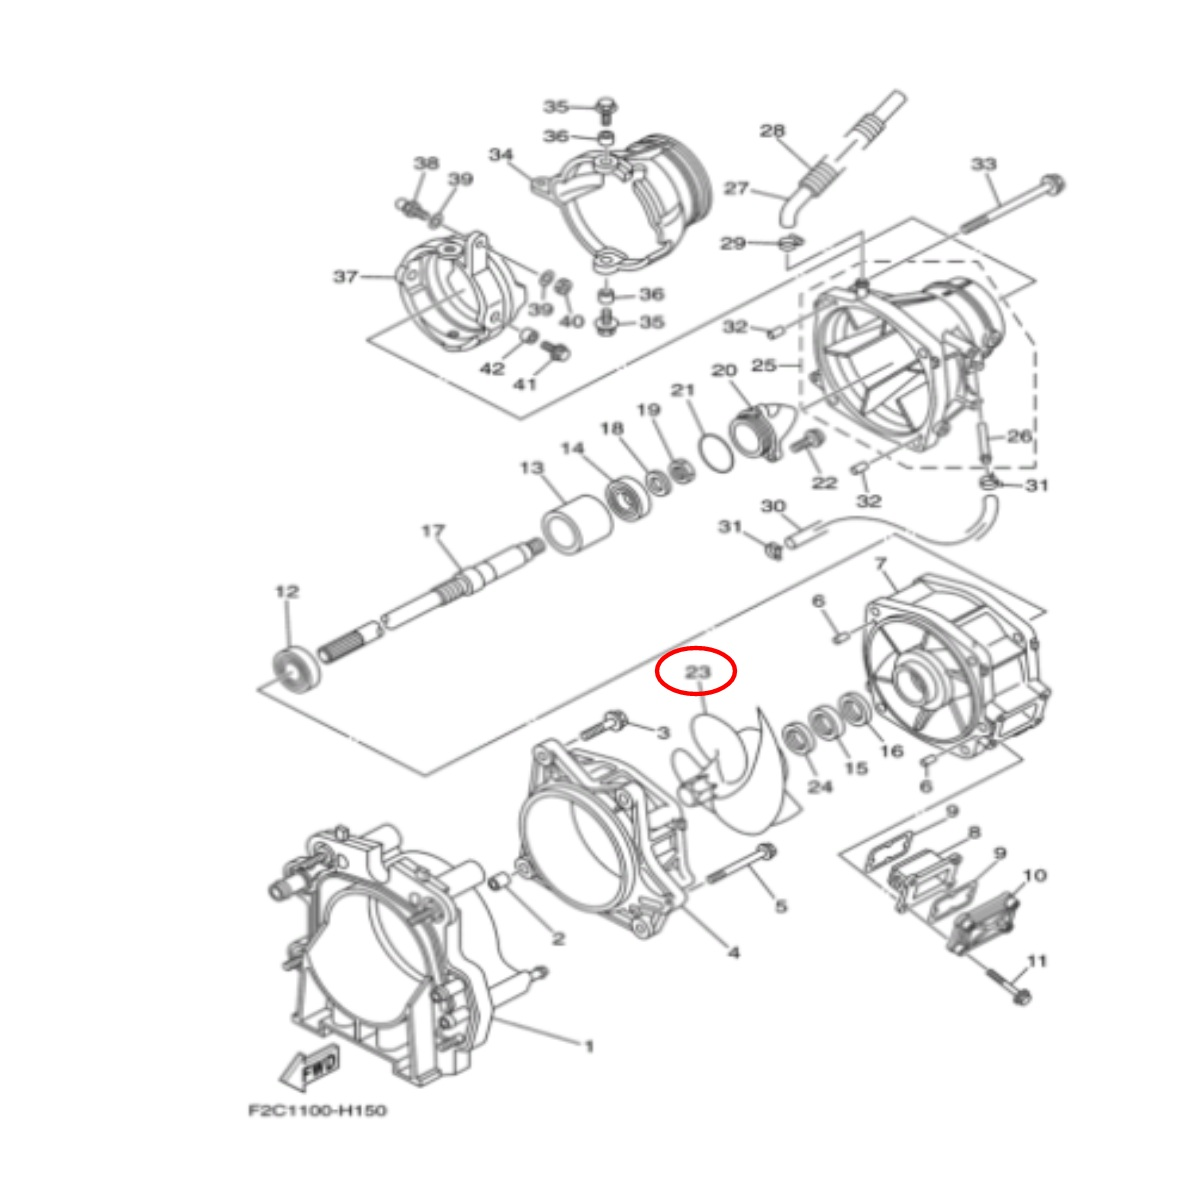 Hélice Solas para Jet Ski Yamaha XL 1200/Wave Raider 1100 155mm 12/18  - Radical Peças - Peças para Jet Ski